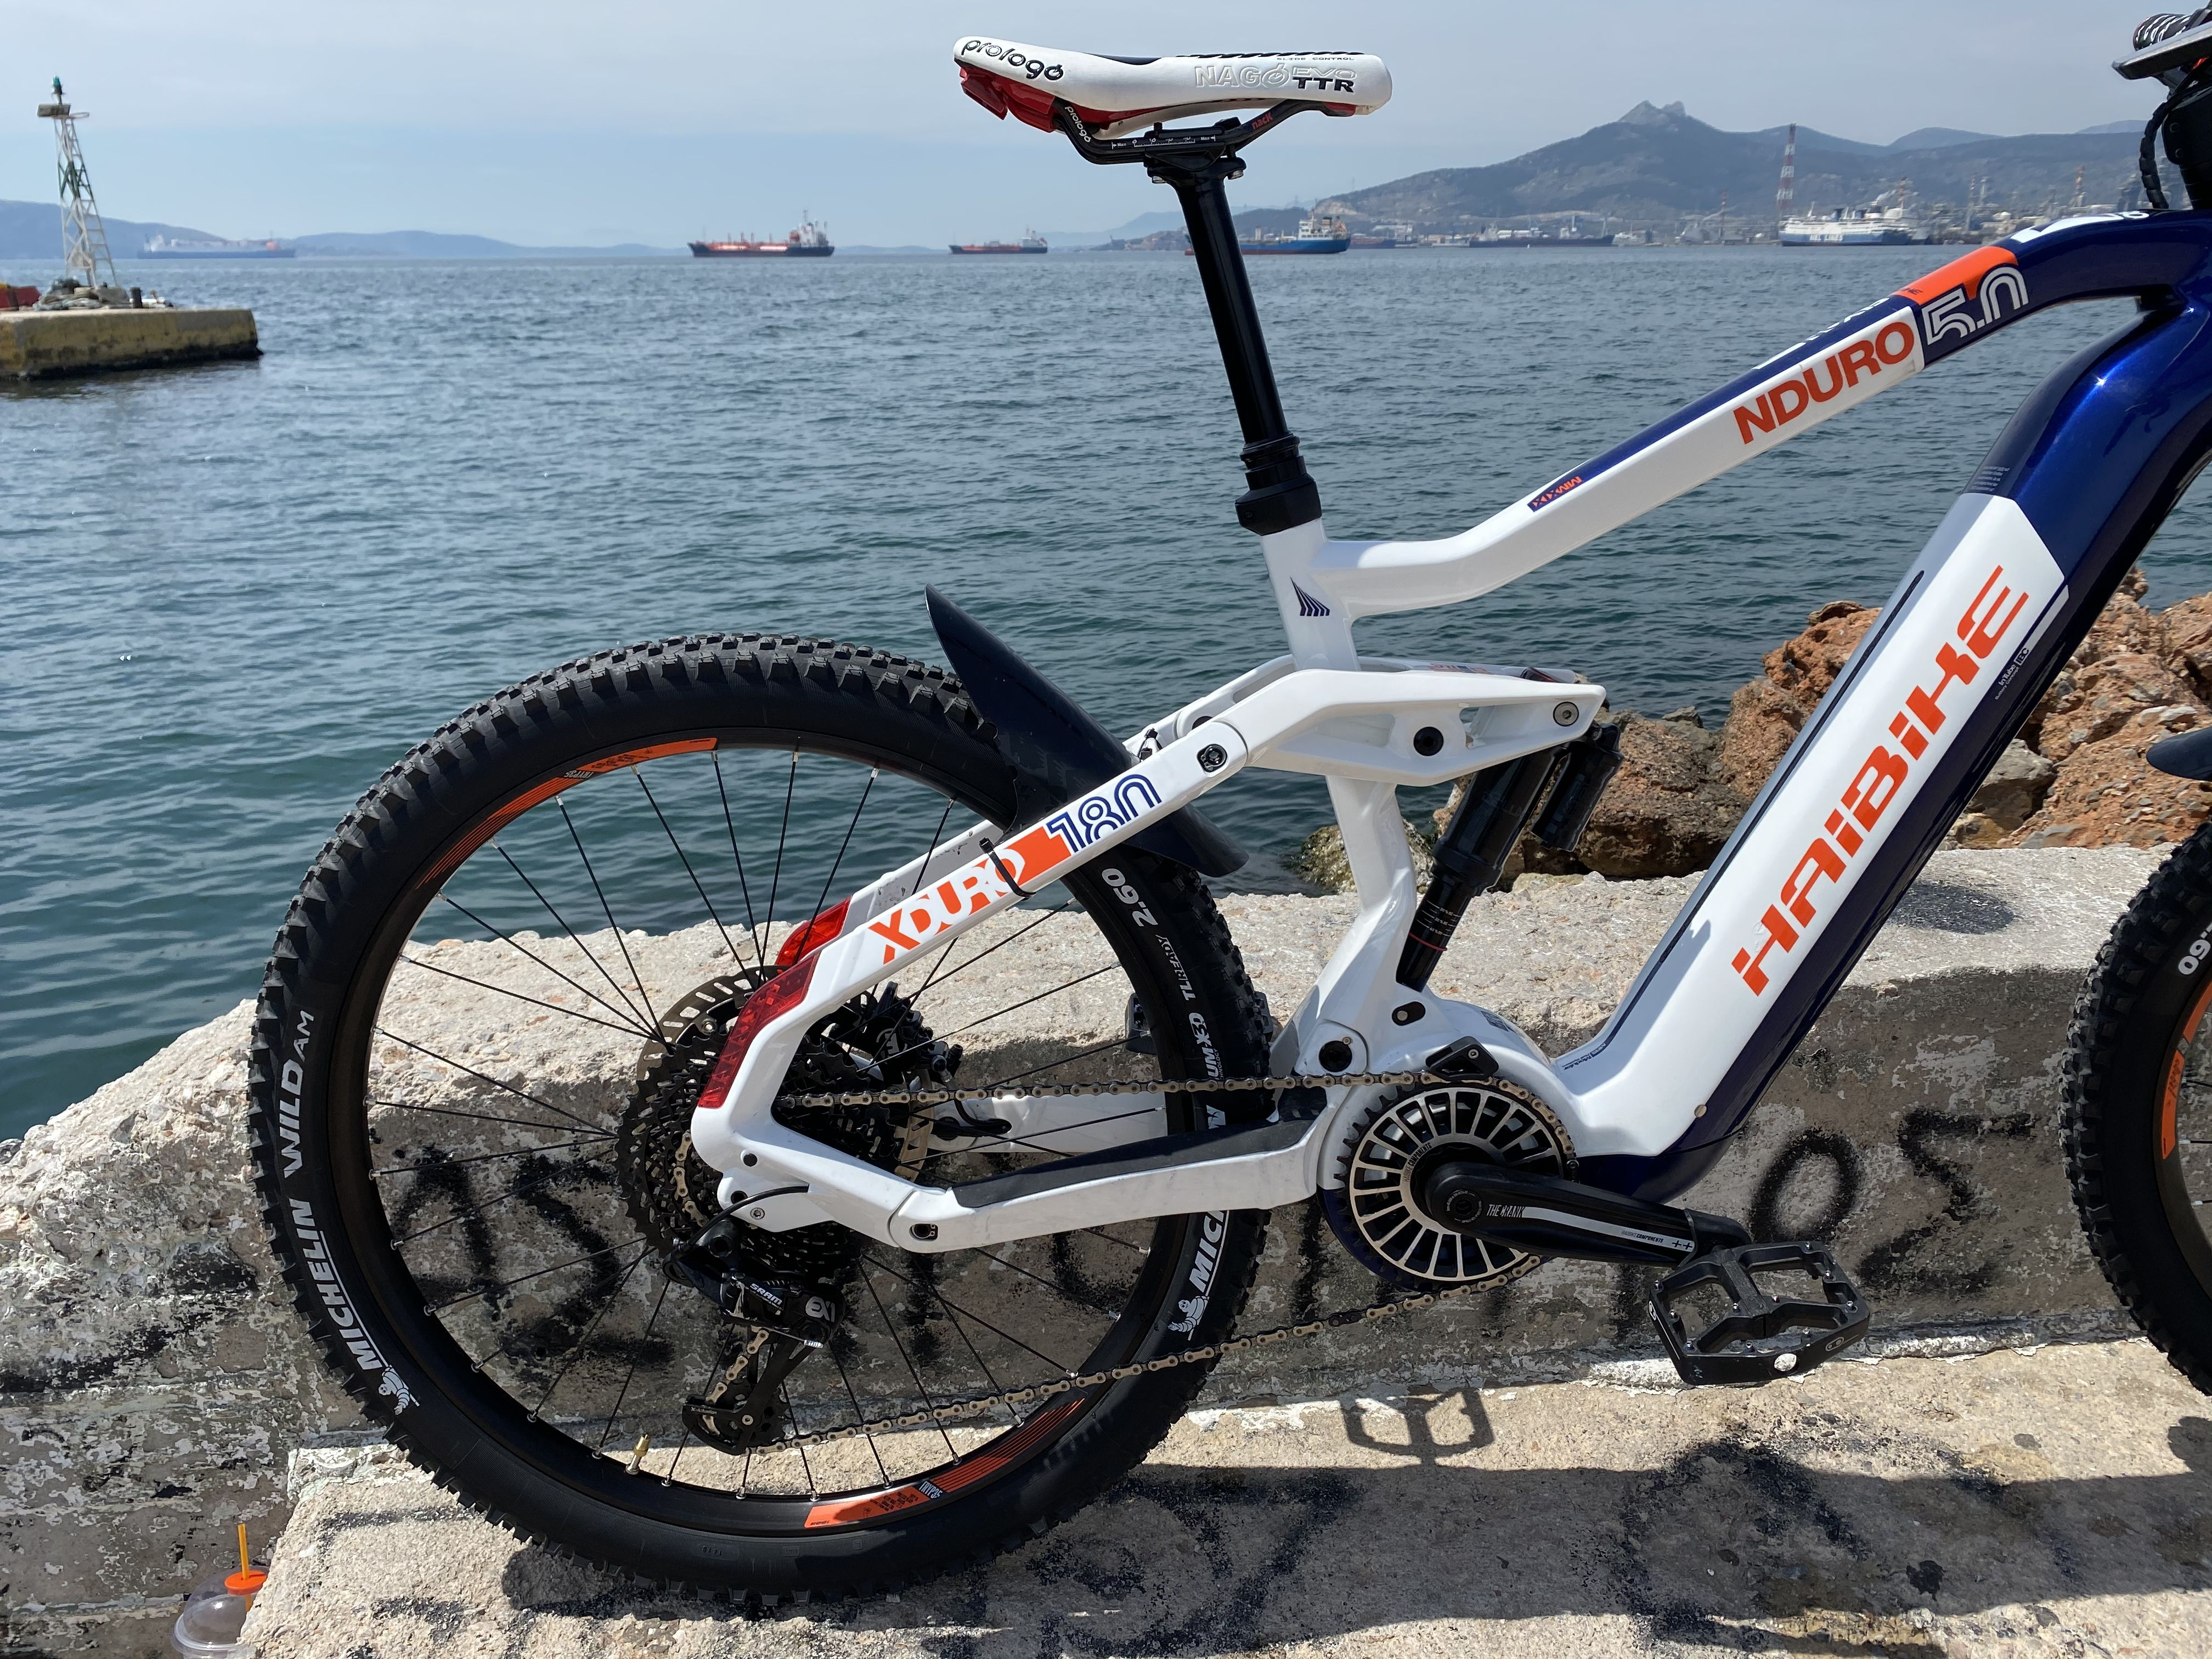 Haibike Nduro 5 Skybeamer Prologo Ttl Twin Tail Lights Xduro Magura In 2020 Ebike Bicycle Vehicles